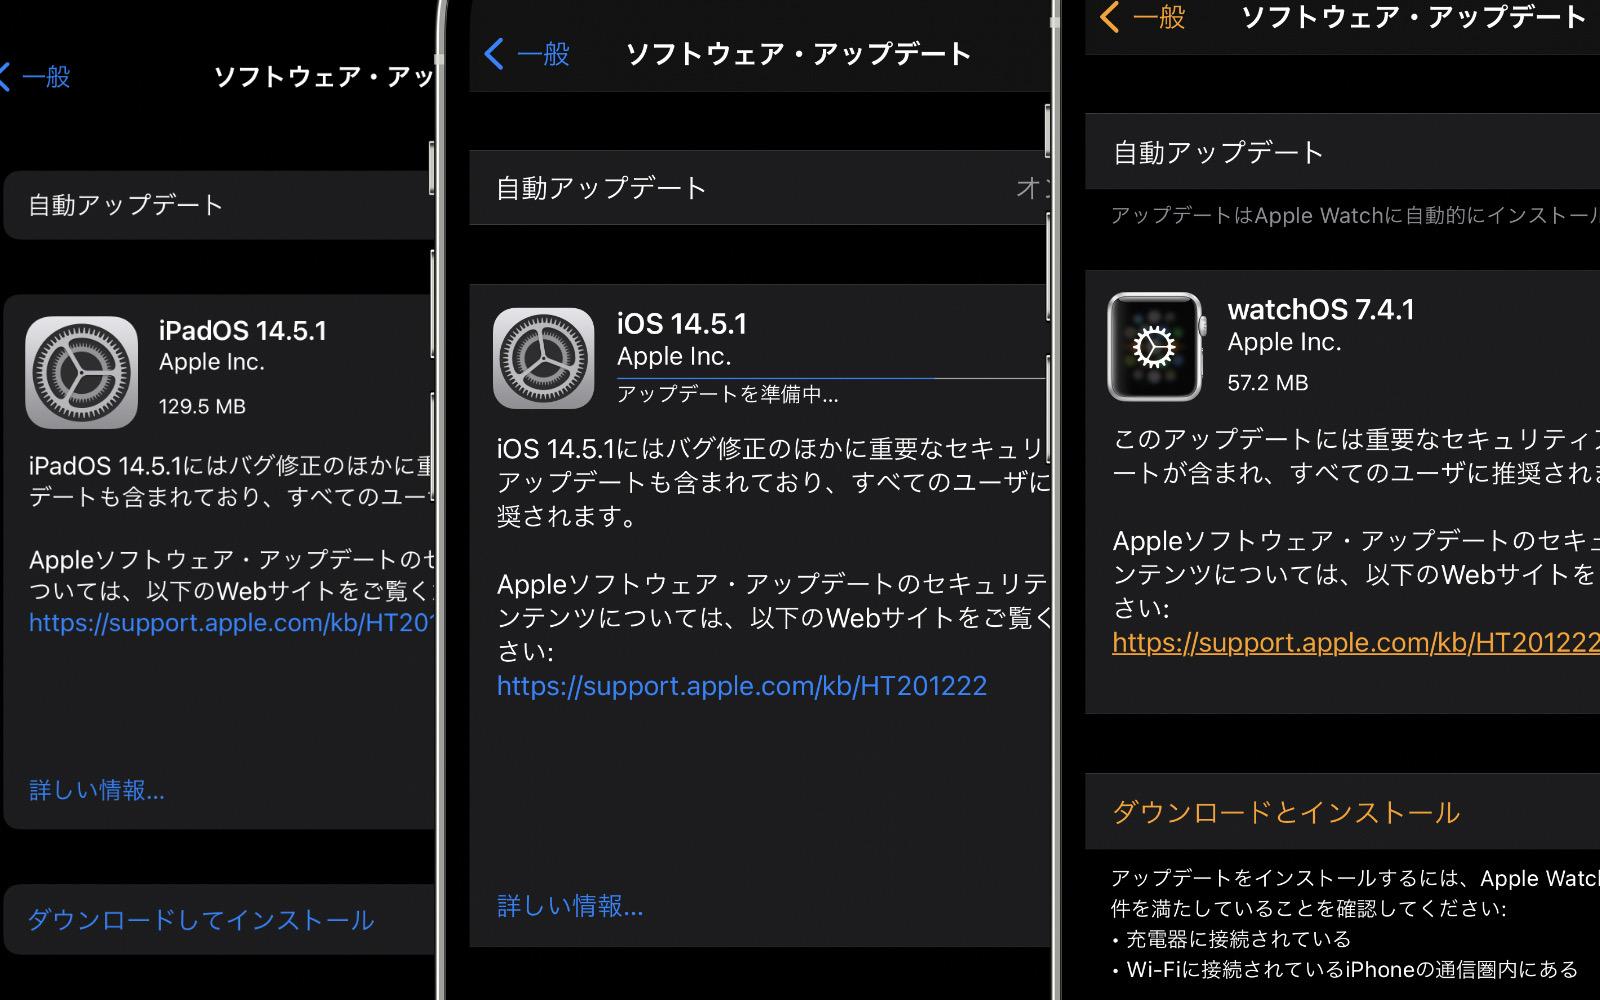 ios-ipados-watchos-updates.jpg